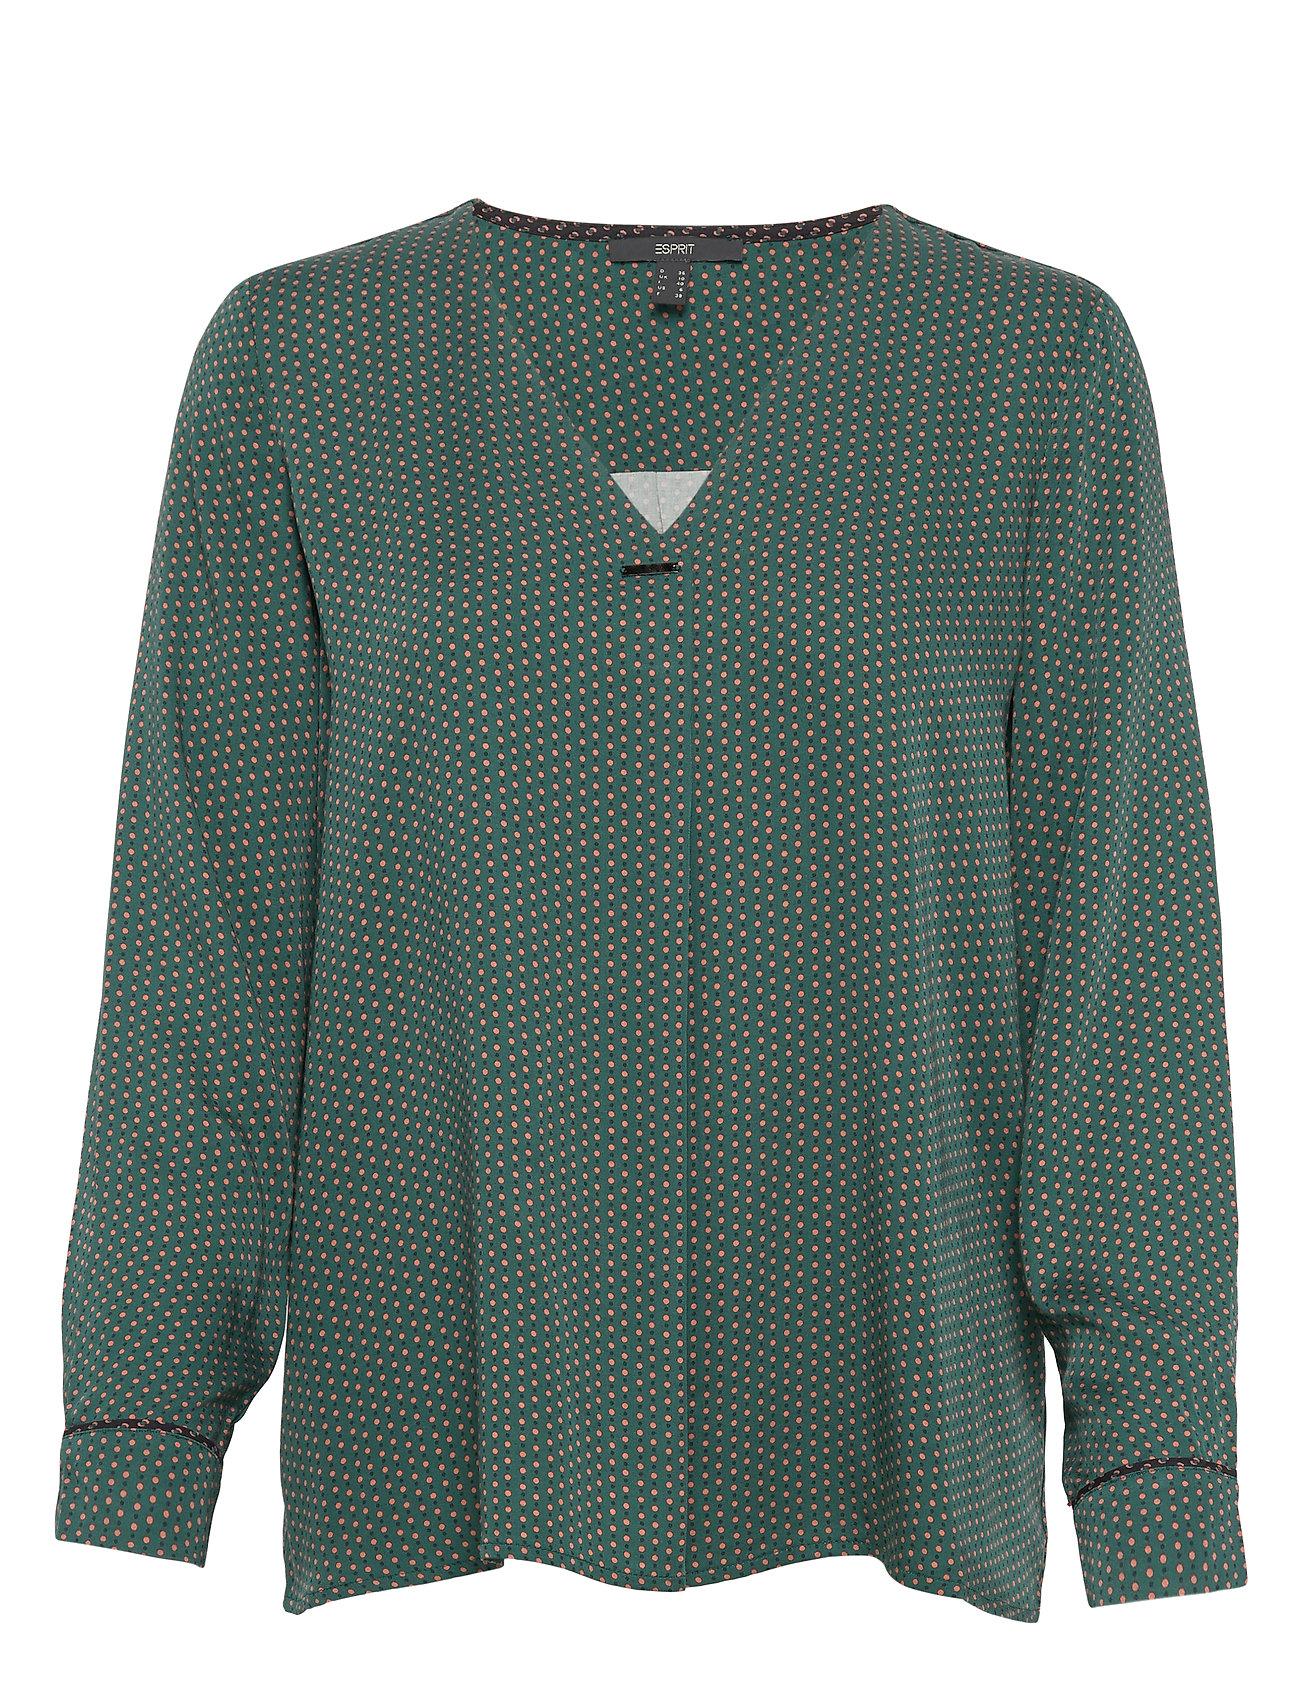 Esprit Collection Blouses woven - BOTTLE GREEN 4